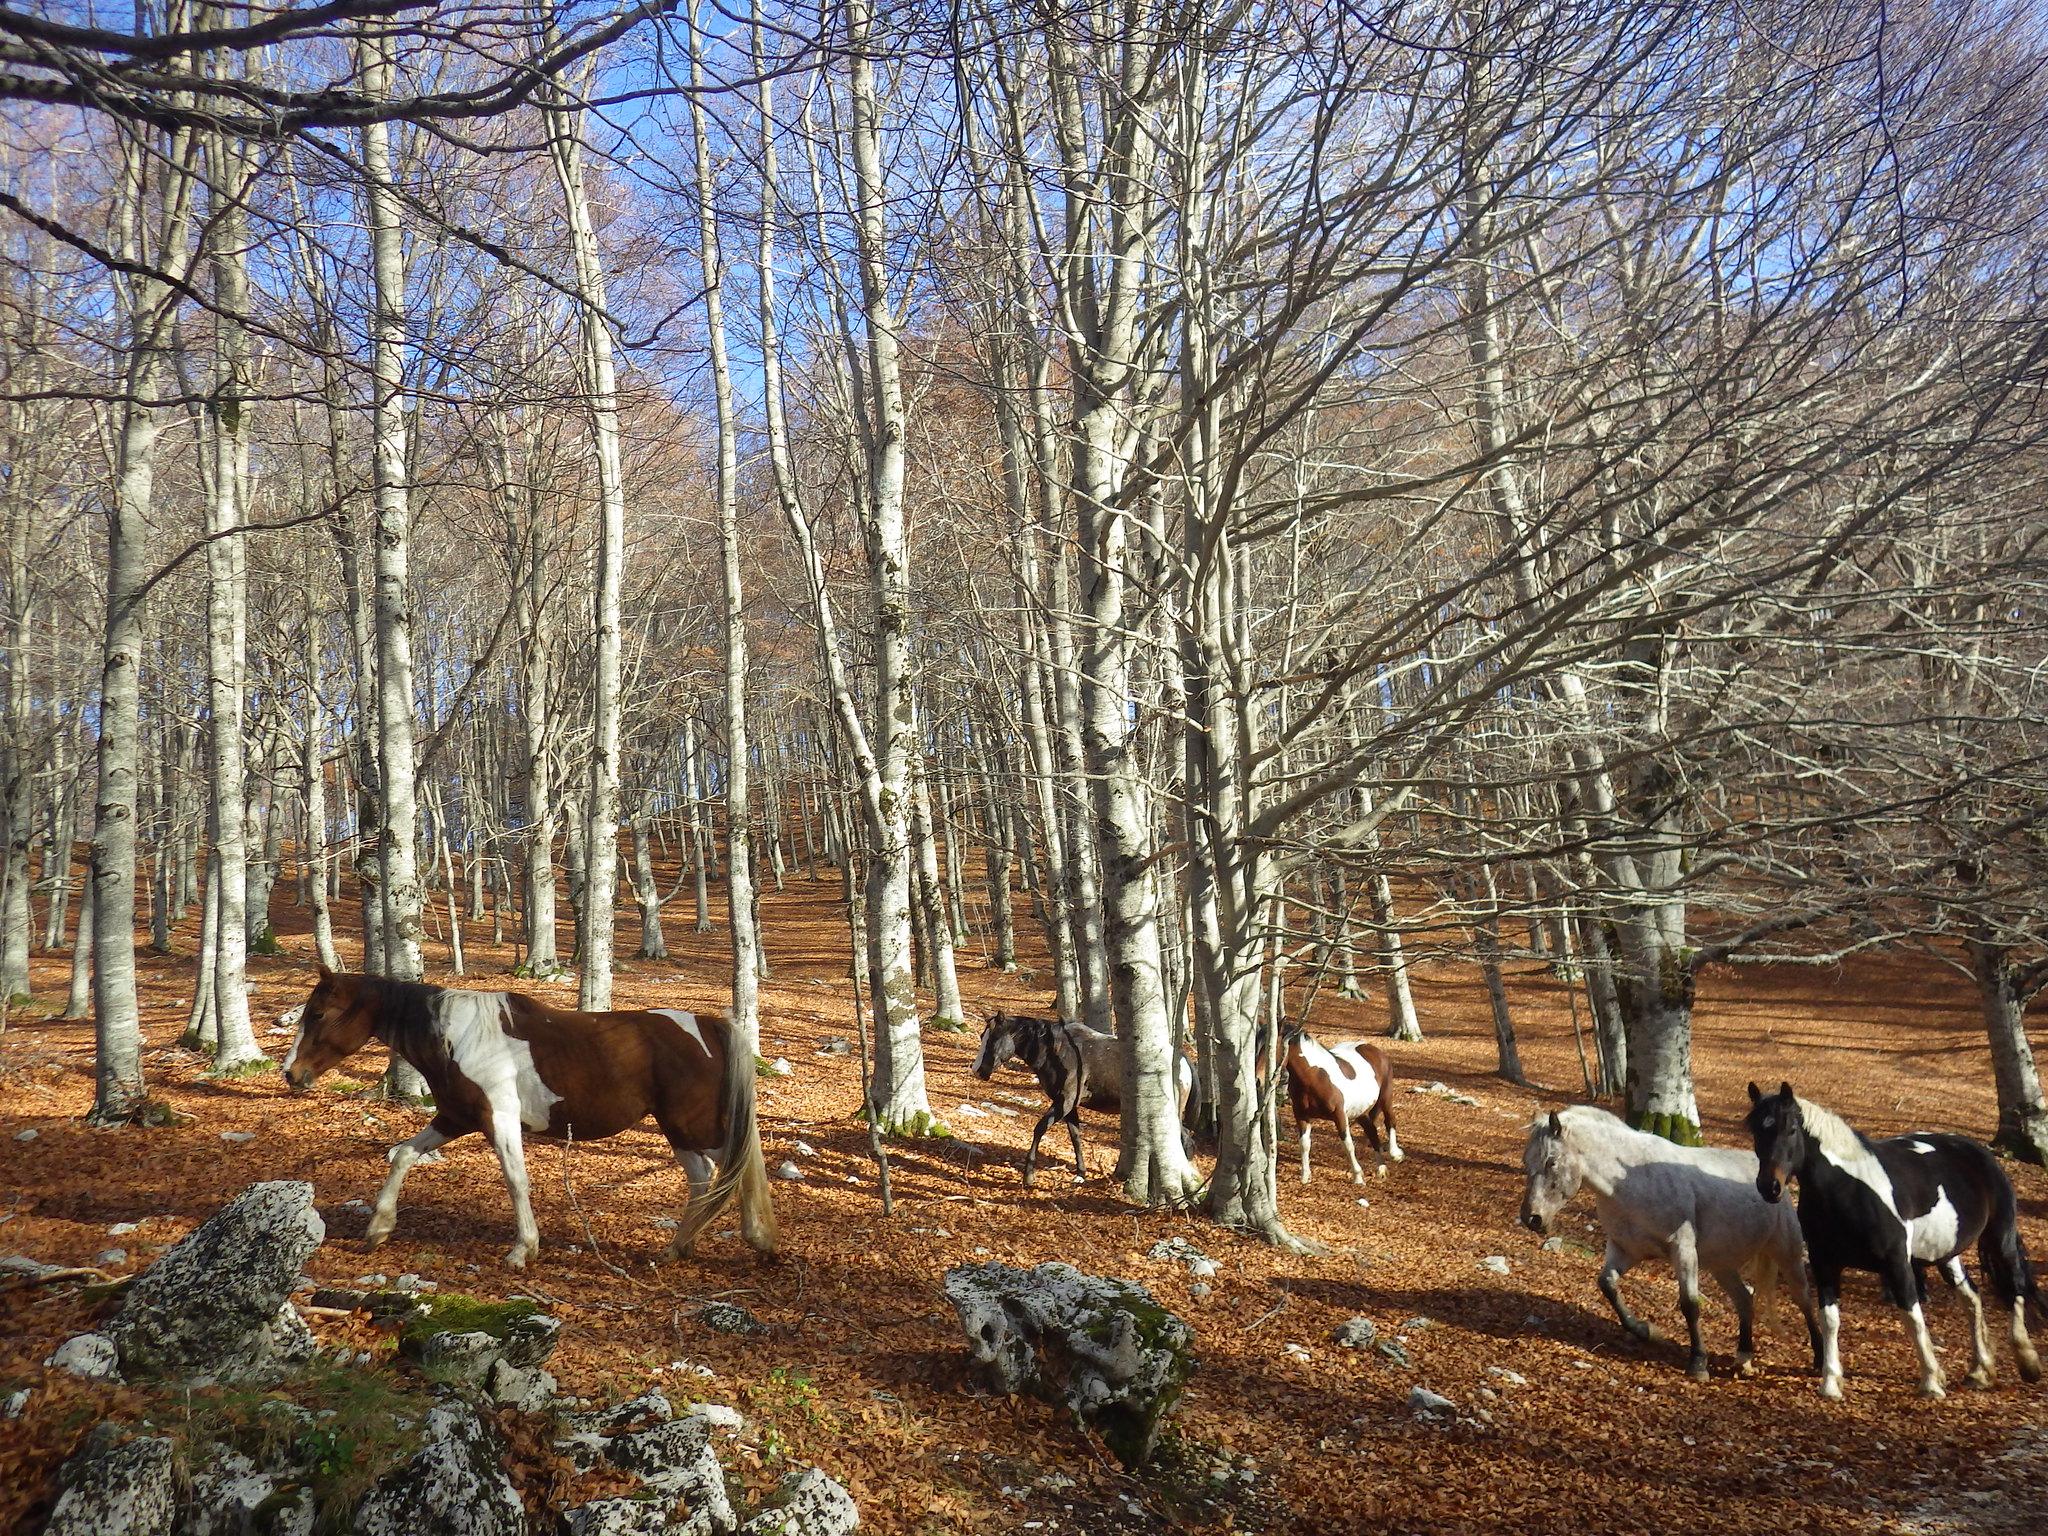 Paesaggi naturali autunnali for Stampe paesaggi naturali